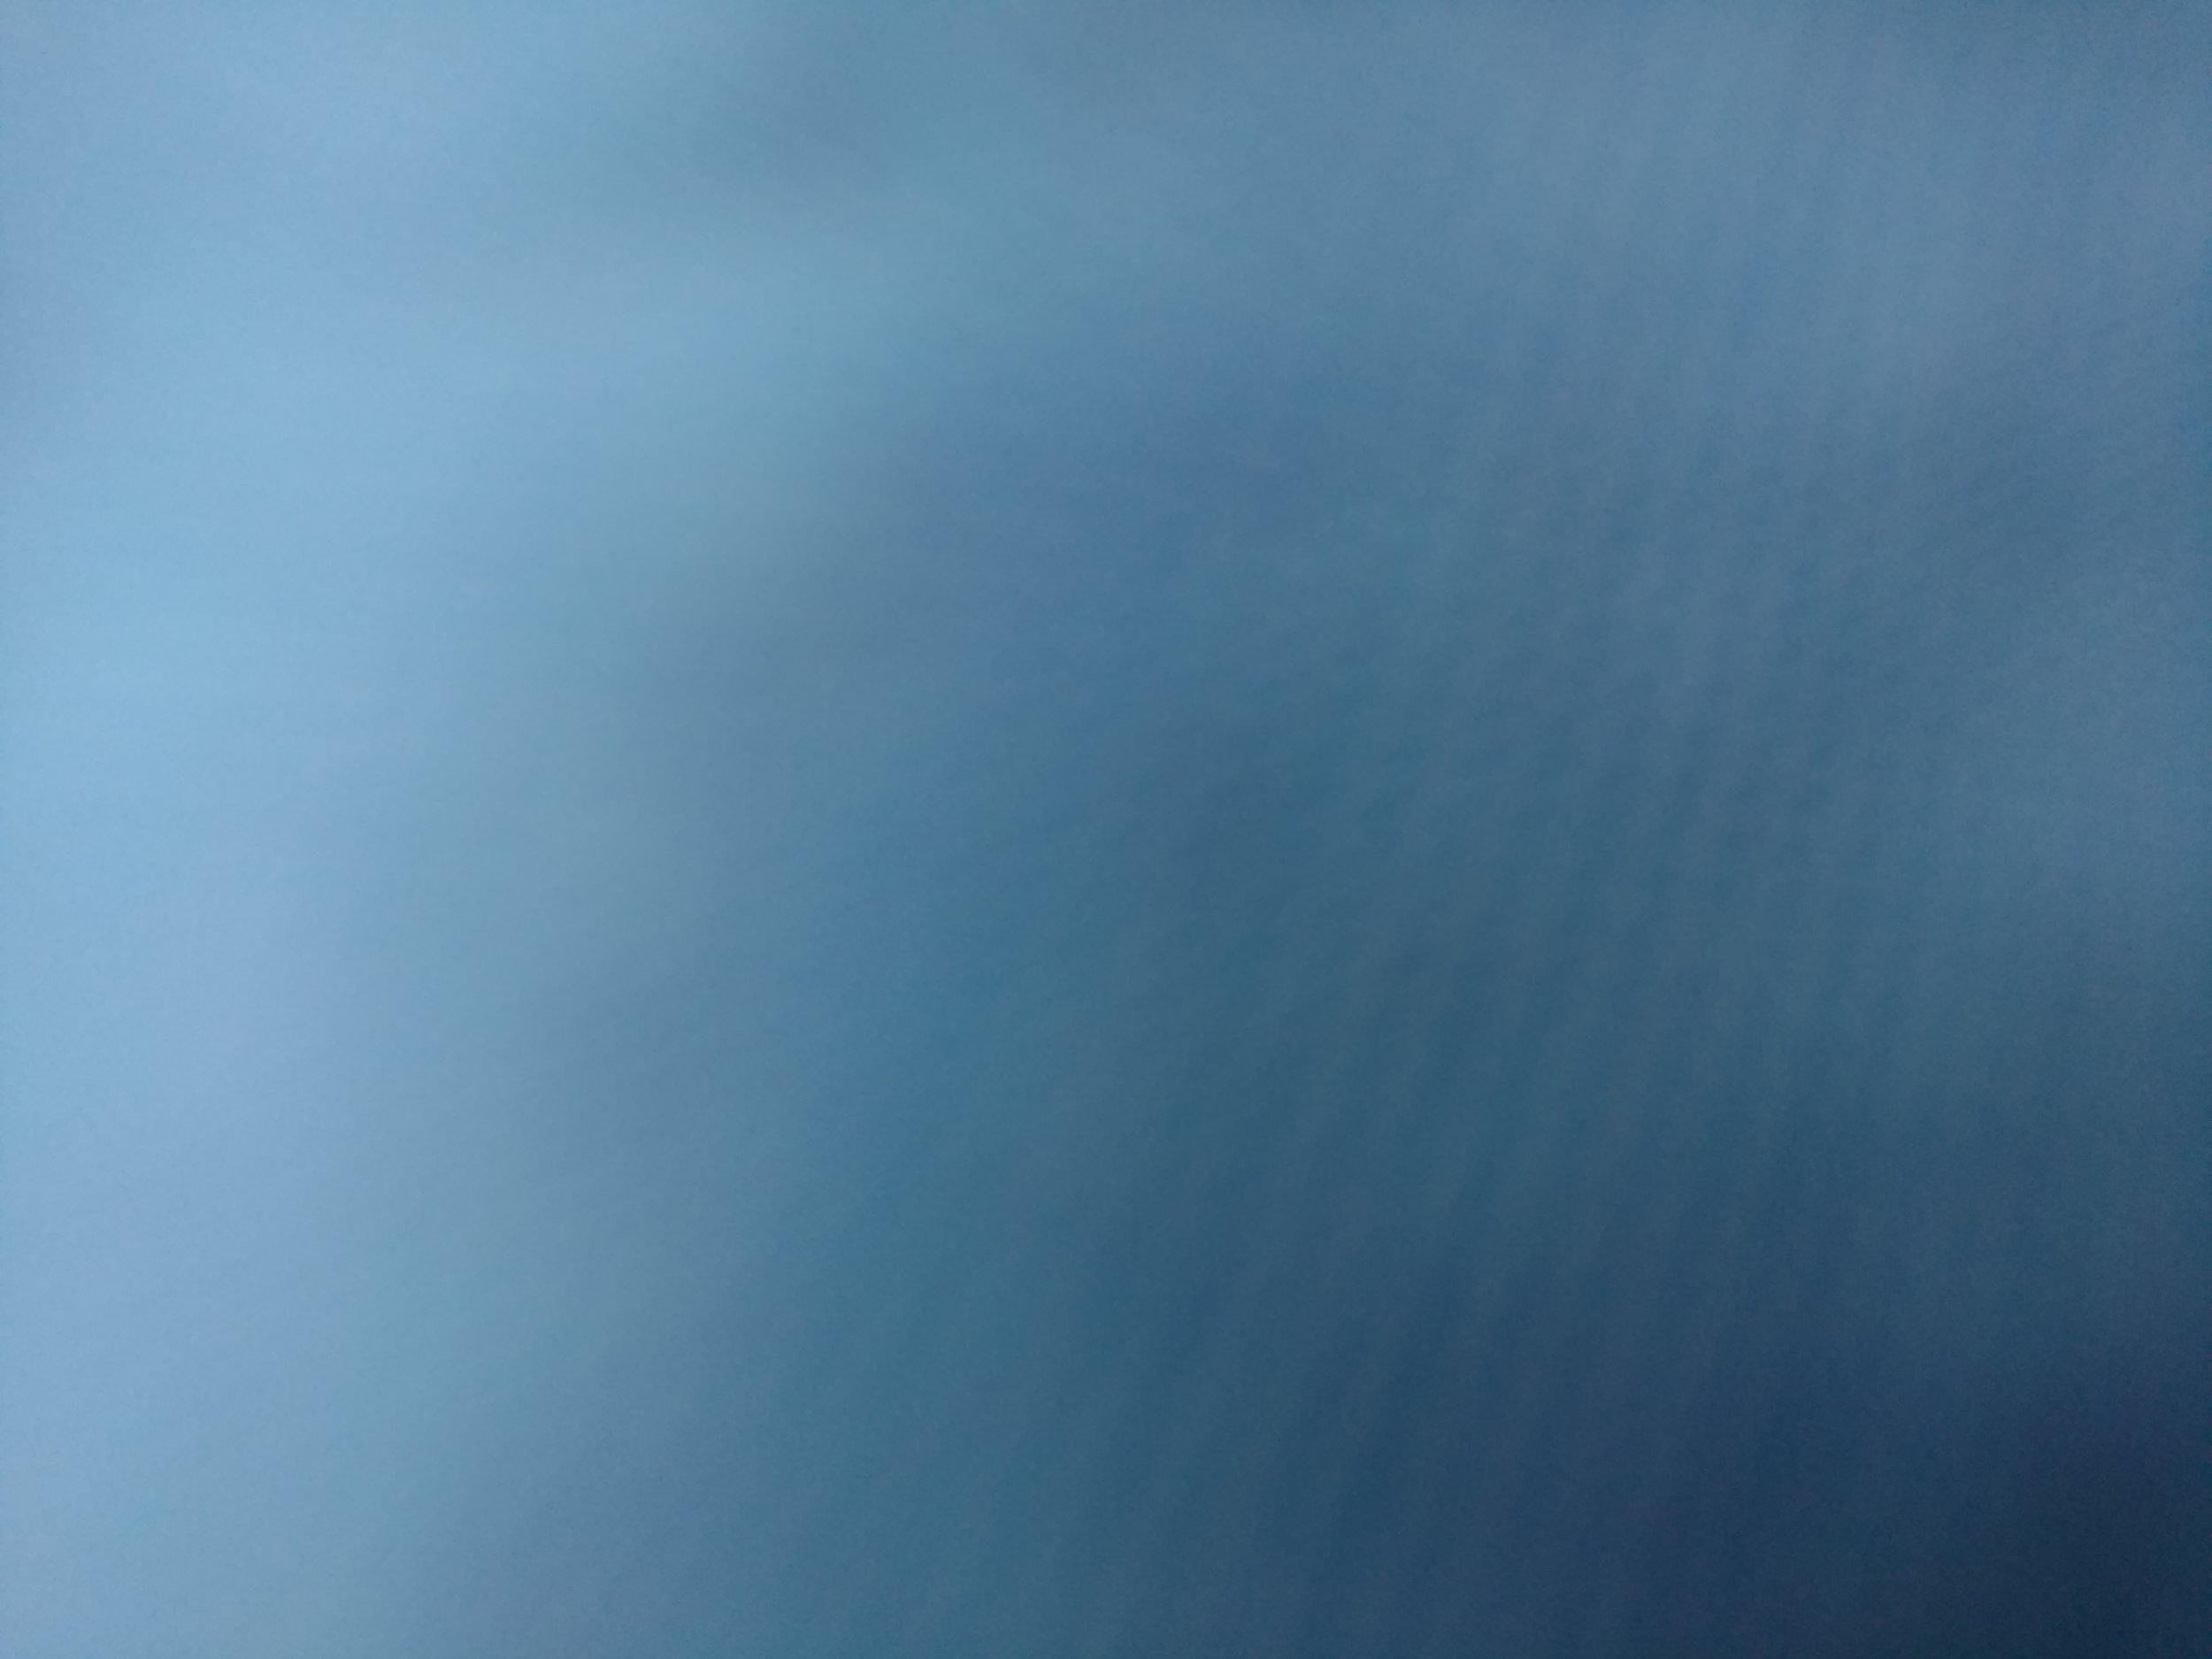 willroth-co-free-texture-gradient-080.jpg